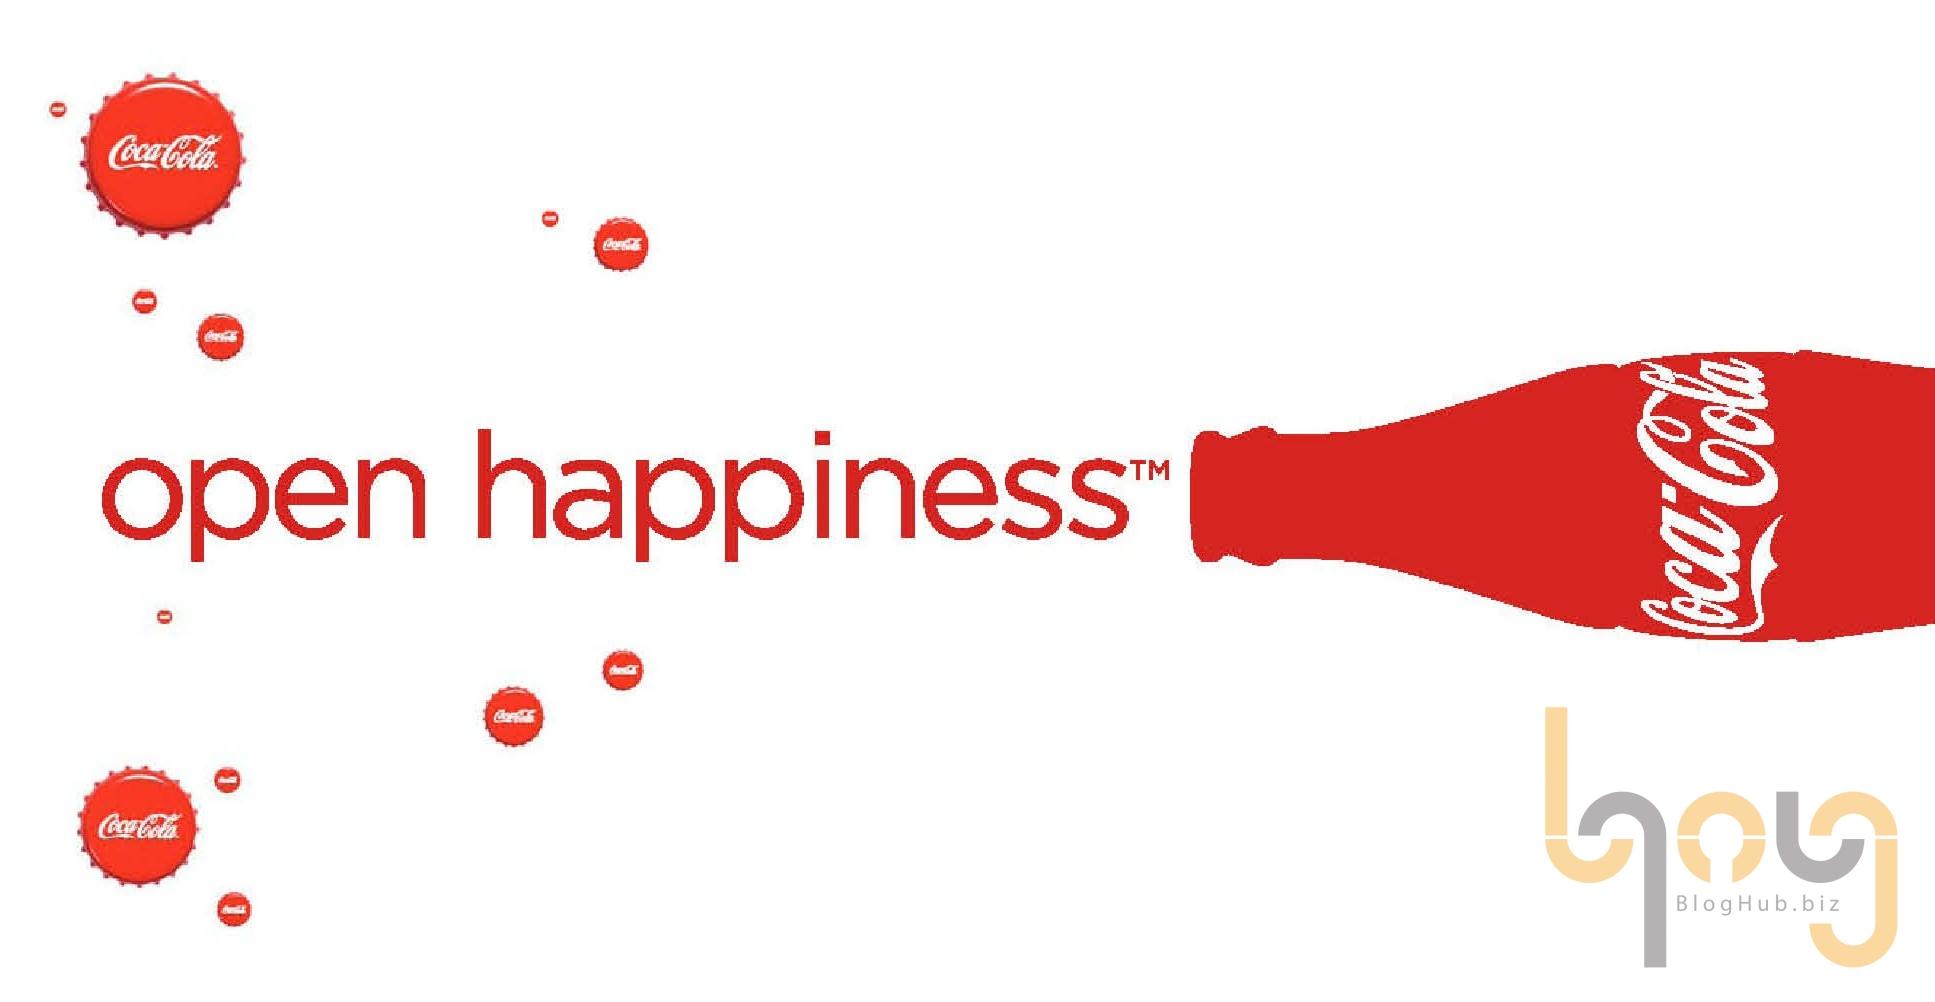 Câu slogan của Coca Cola